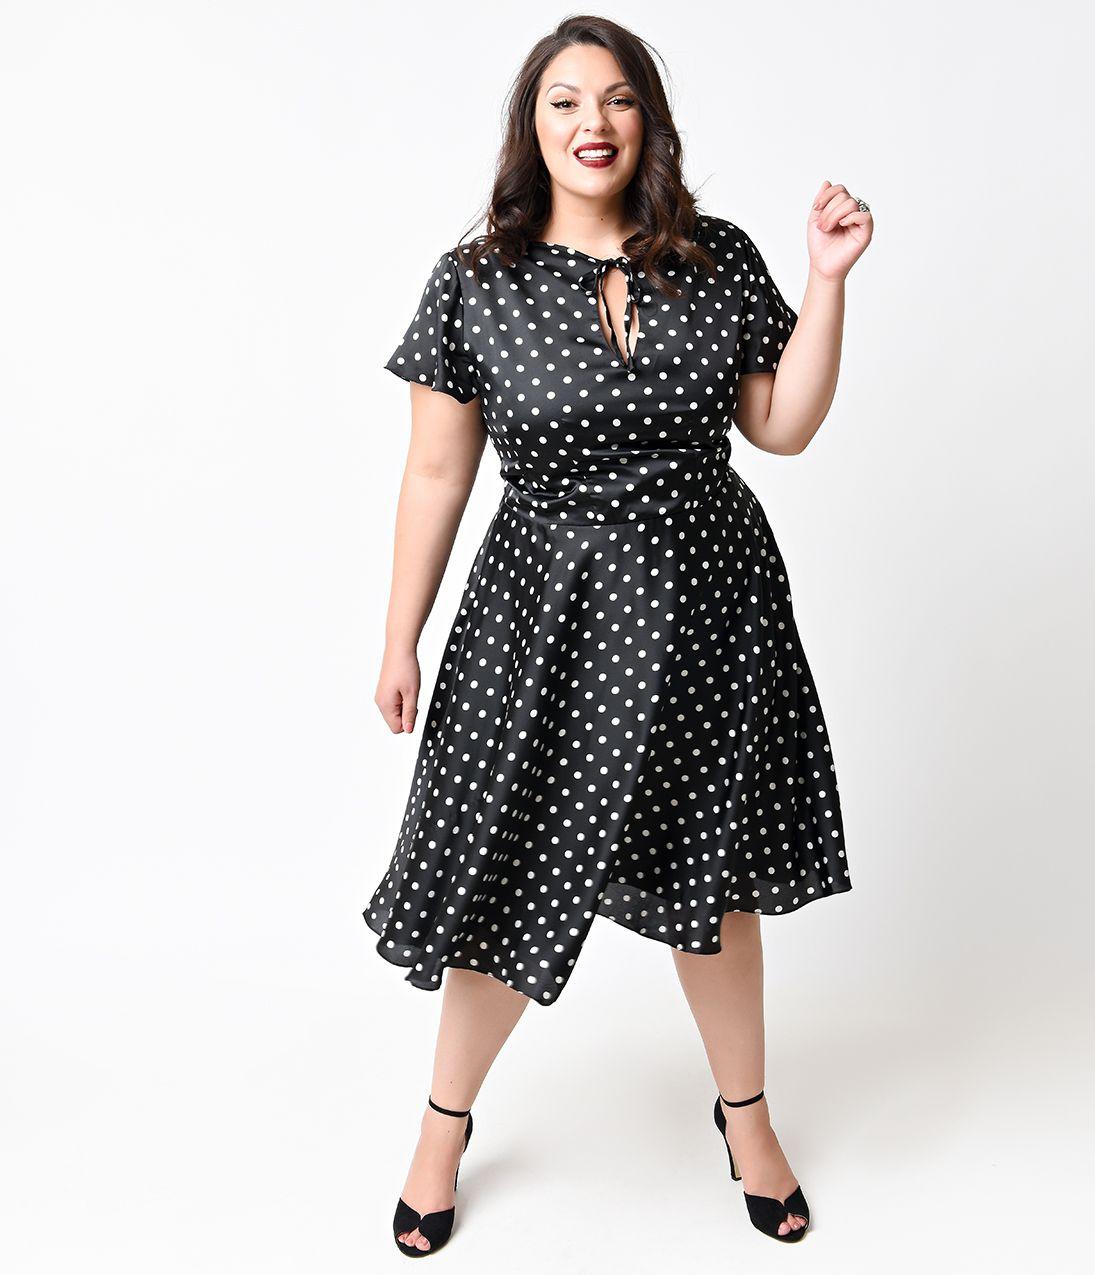 Vintage Style 1940s Plus Size Dresses in 2019 | Plus size ...